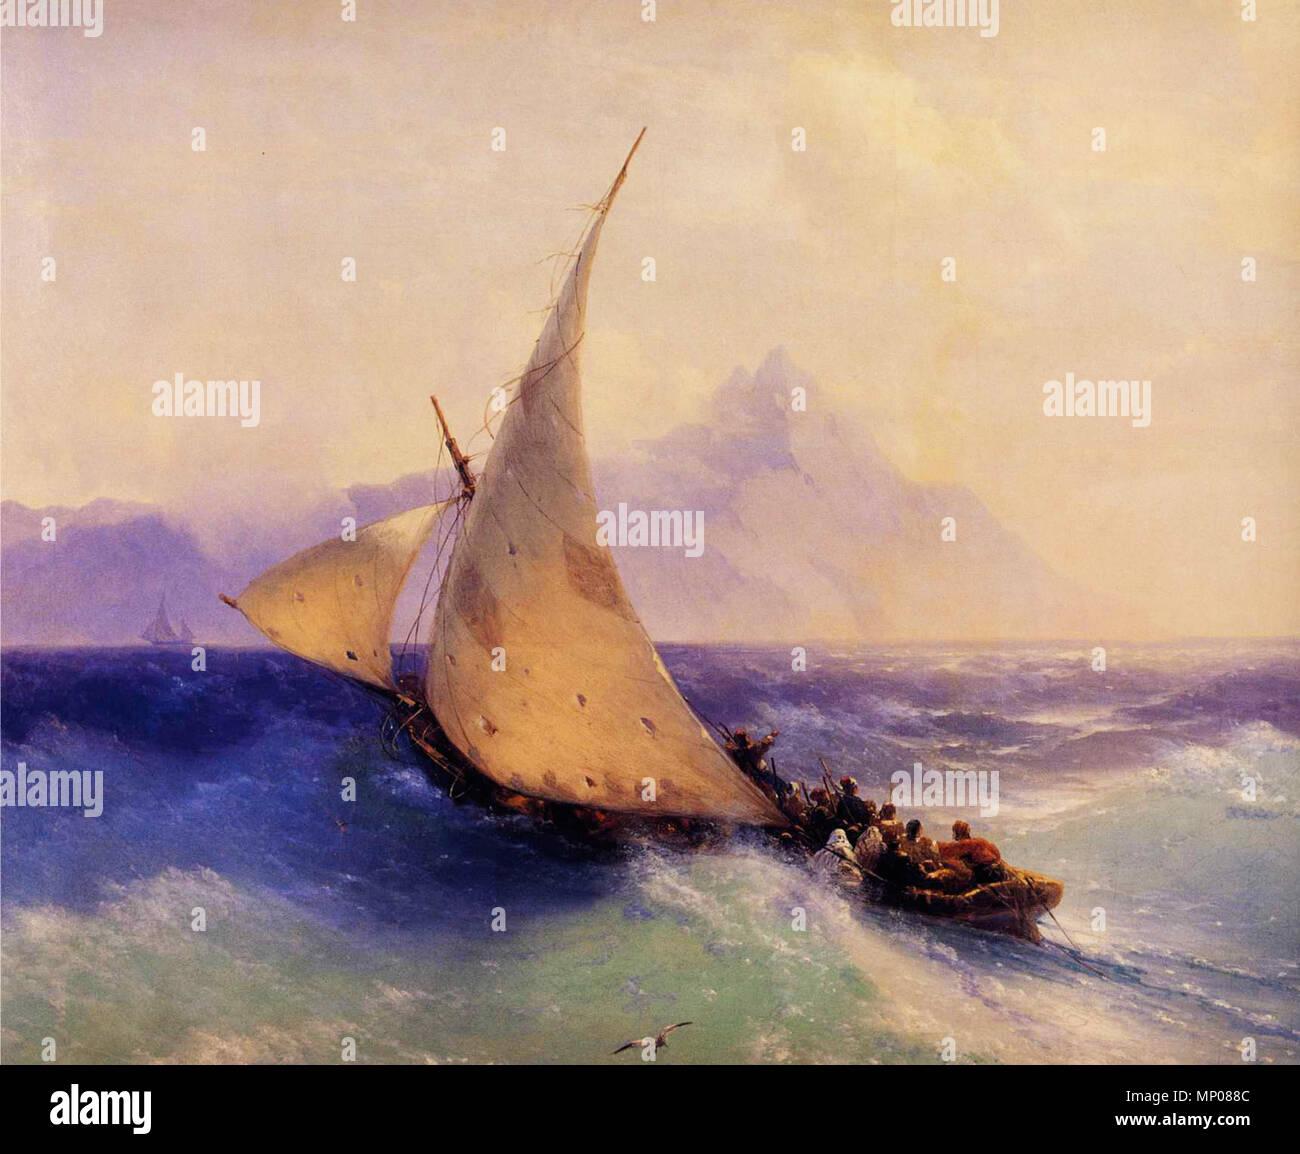 etude - seascape with ship on sea Sea Oil Ivan Constantinovich Aivazovsky